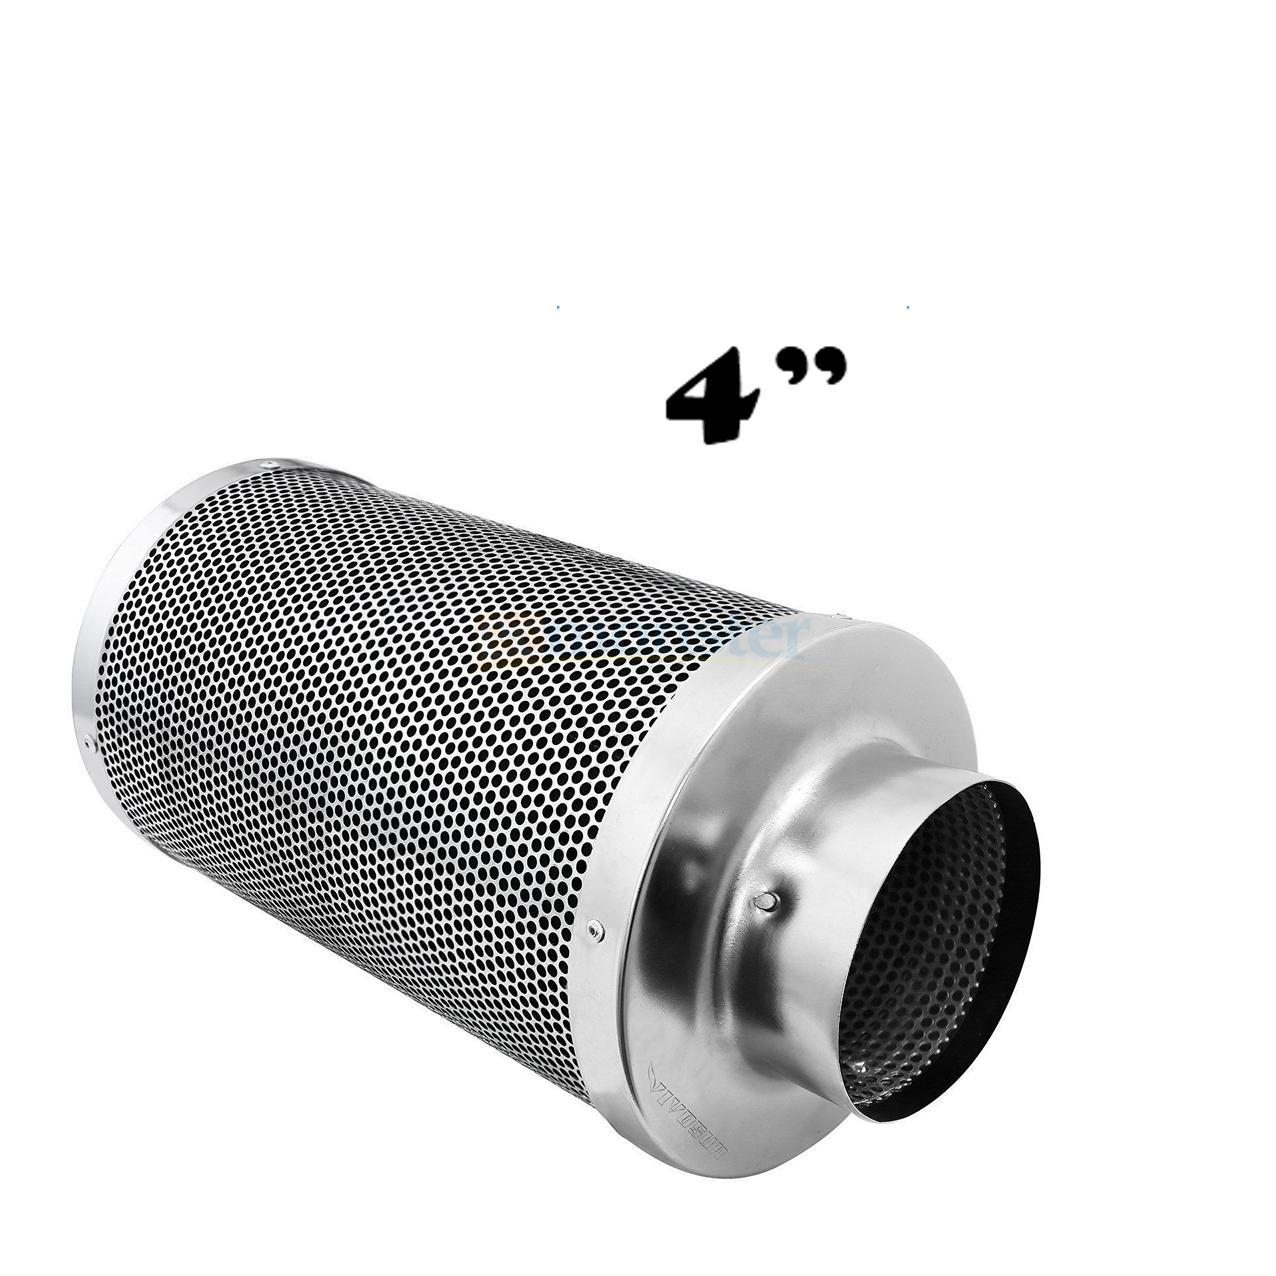 Inline Fan Structure : Air filter virgin carbon charcoal inline fan scrubber odor